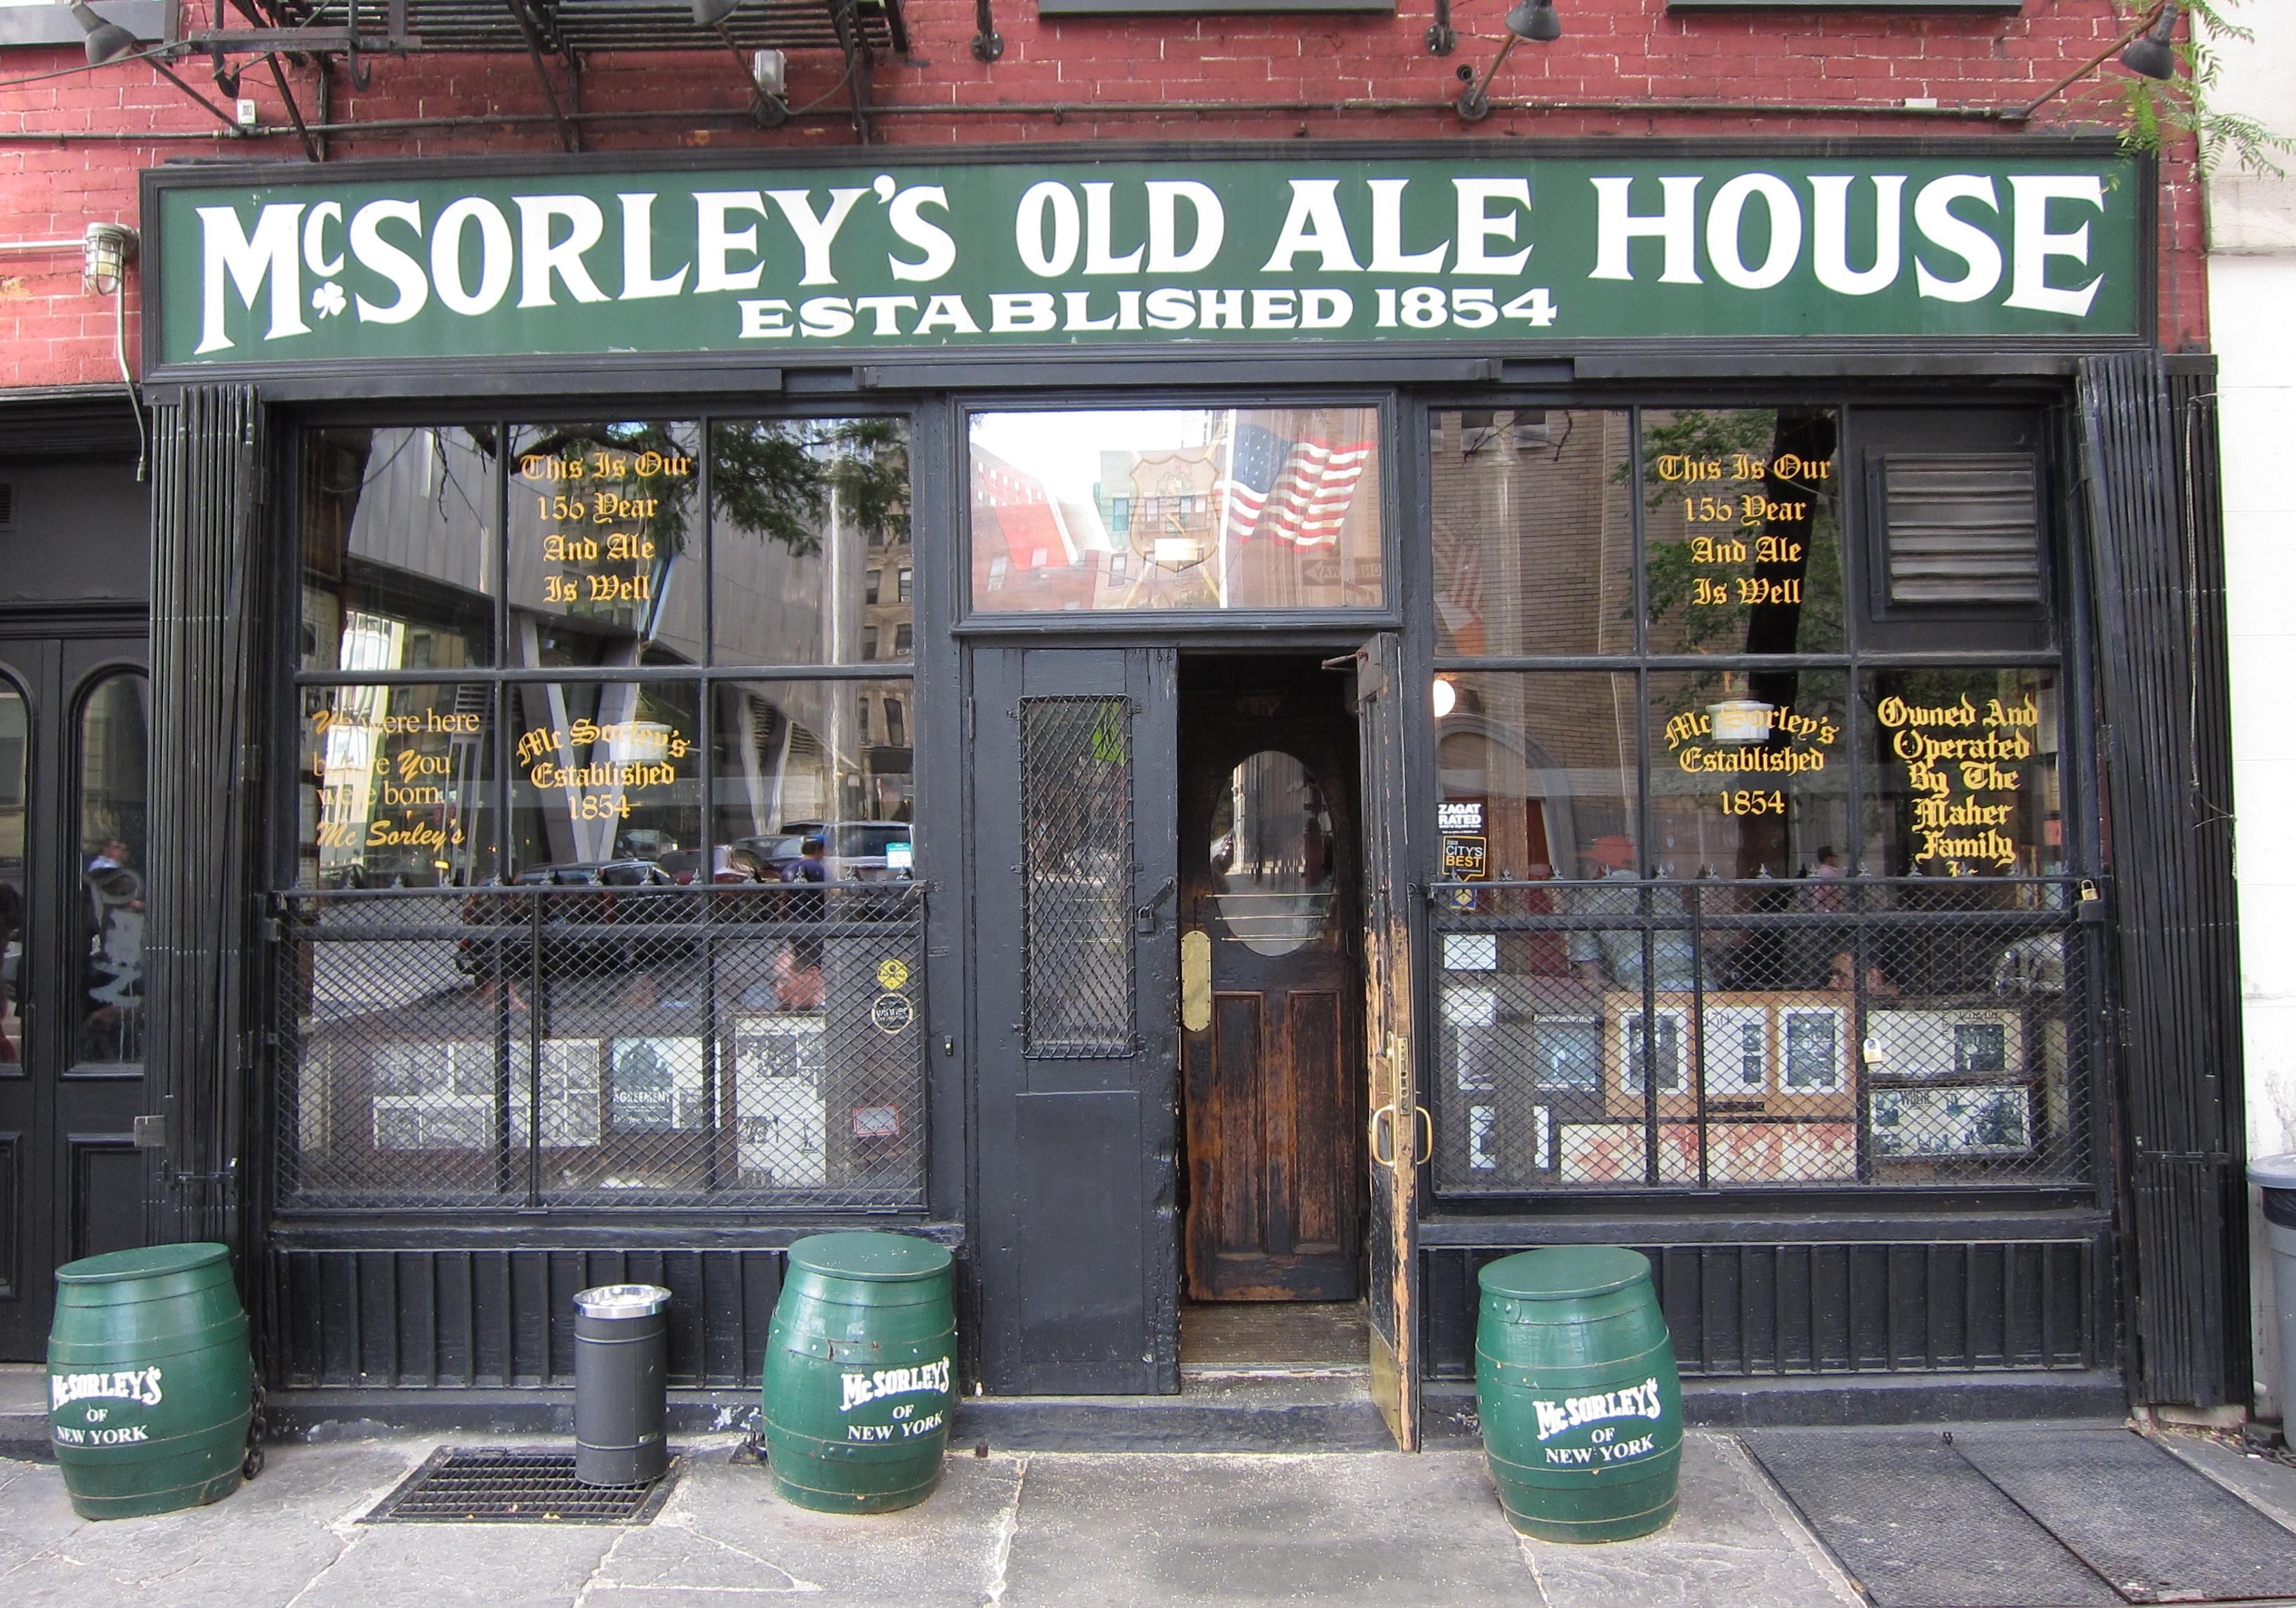 Hayes strip pub raid update: six admit